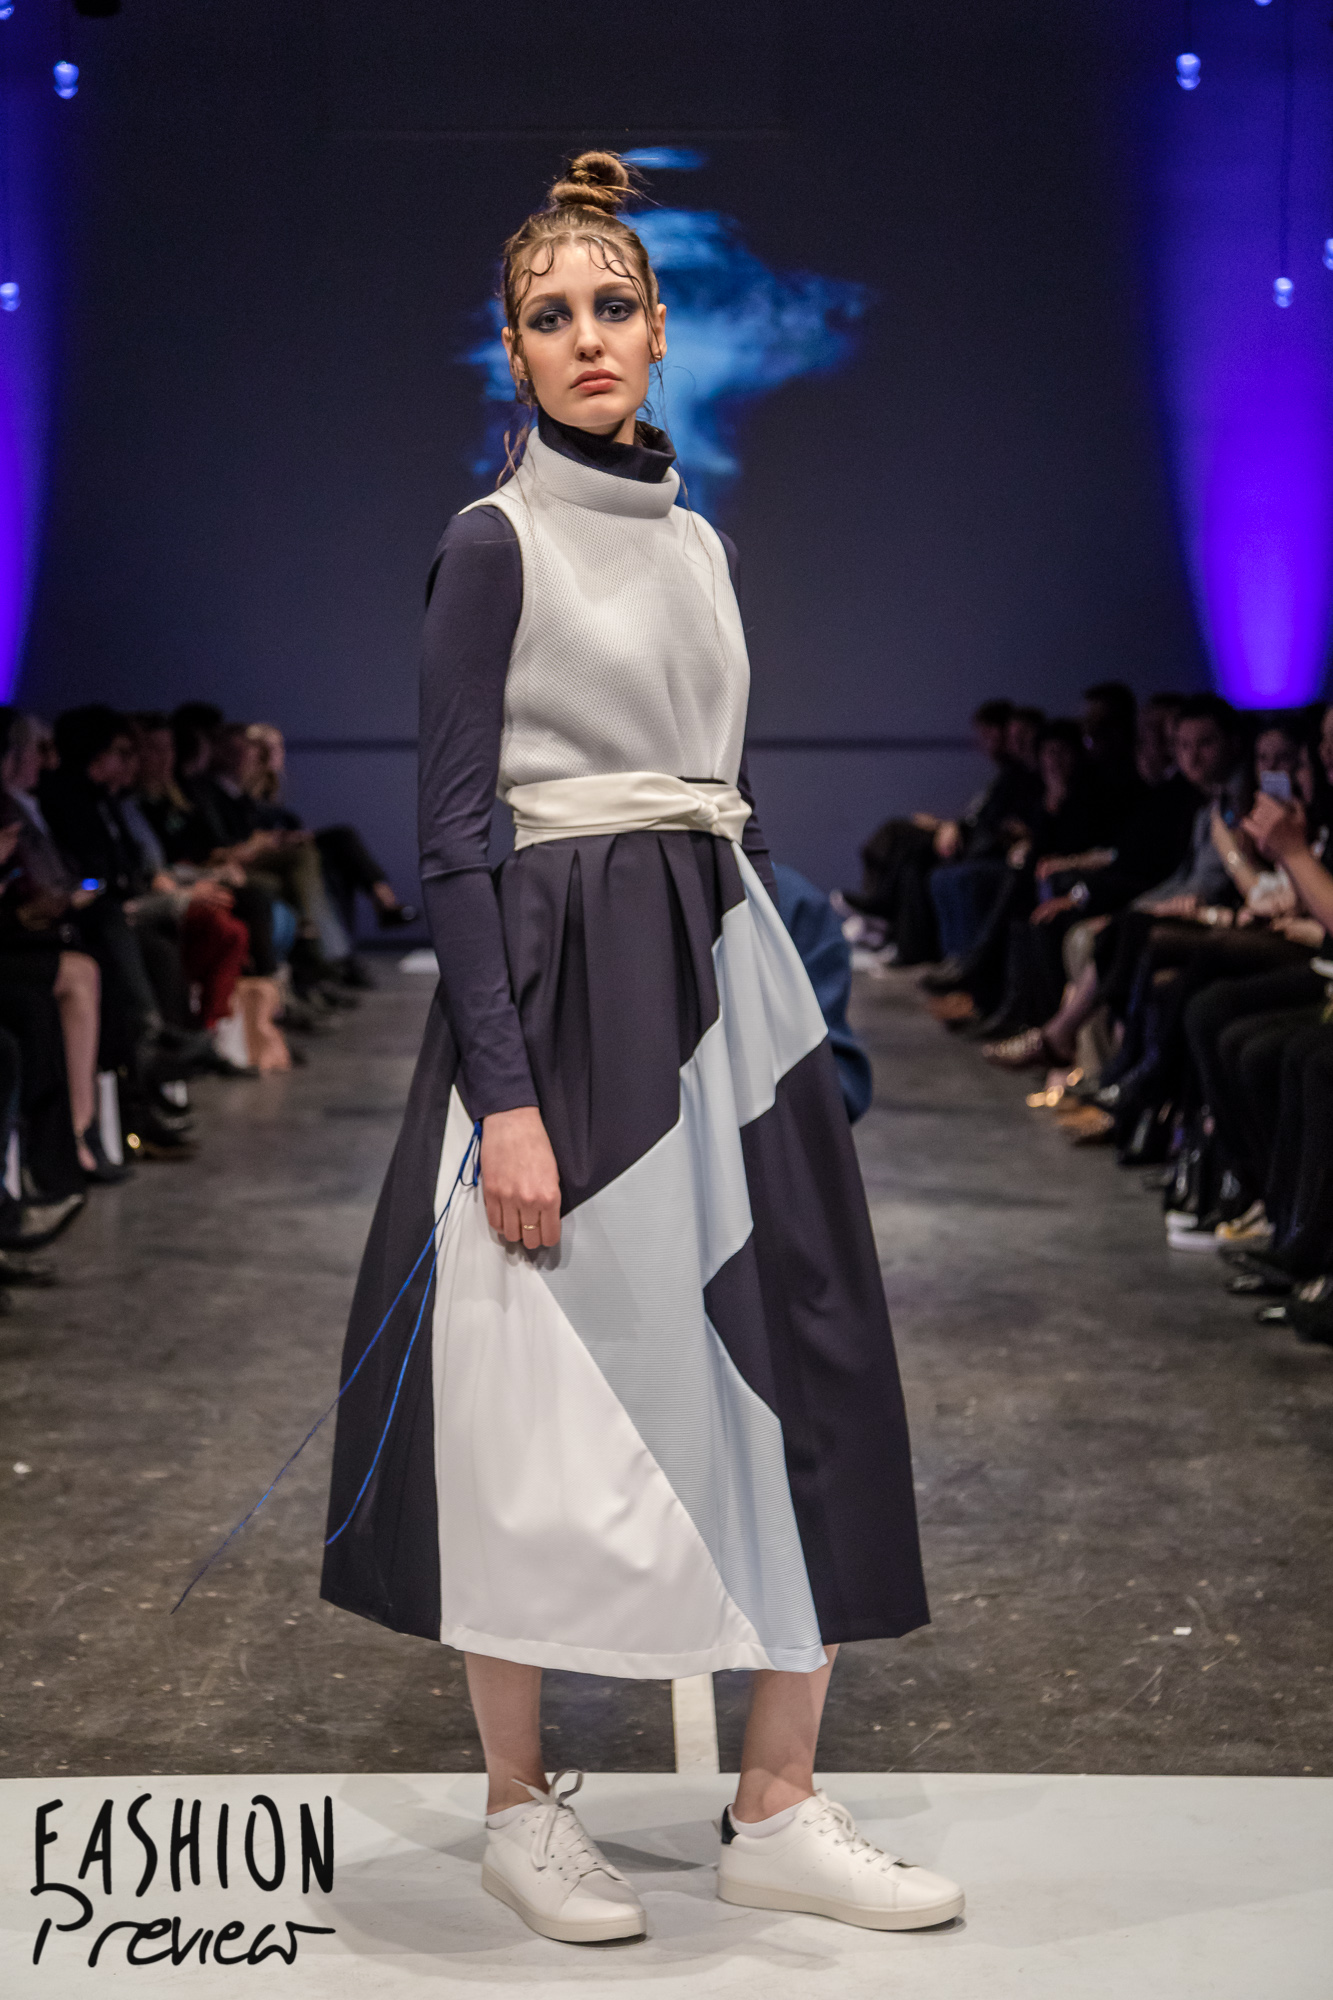 Fashion Preview 9 - Cegep Marie Victorin-07.jpg